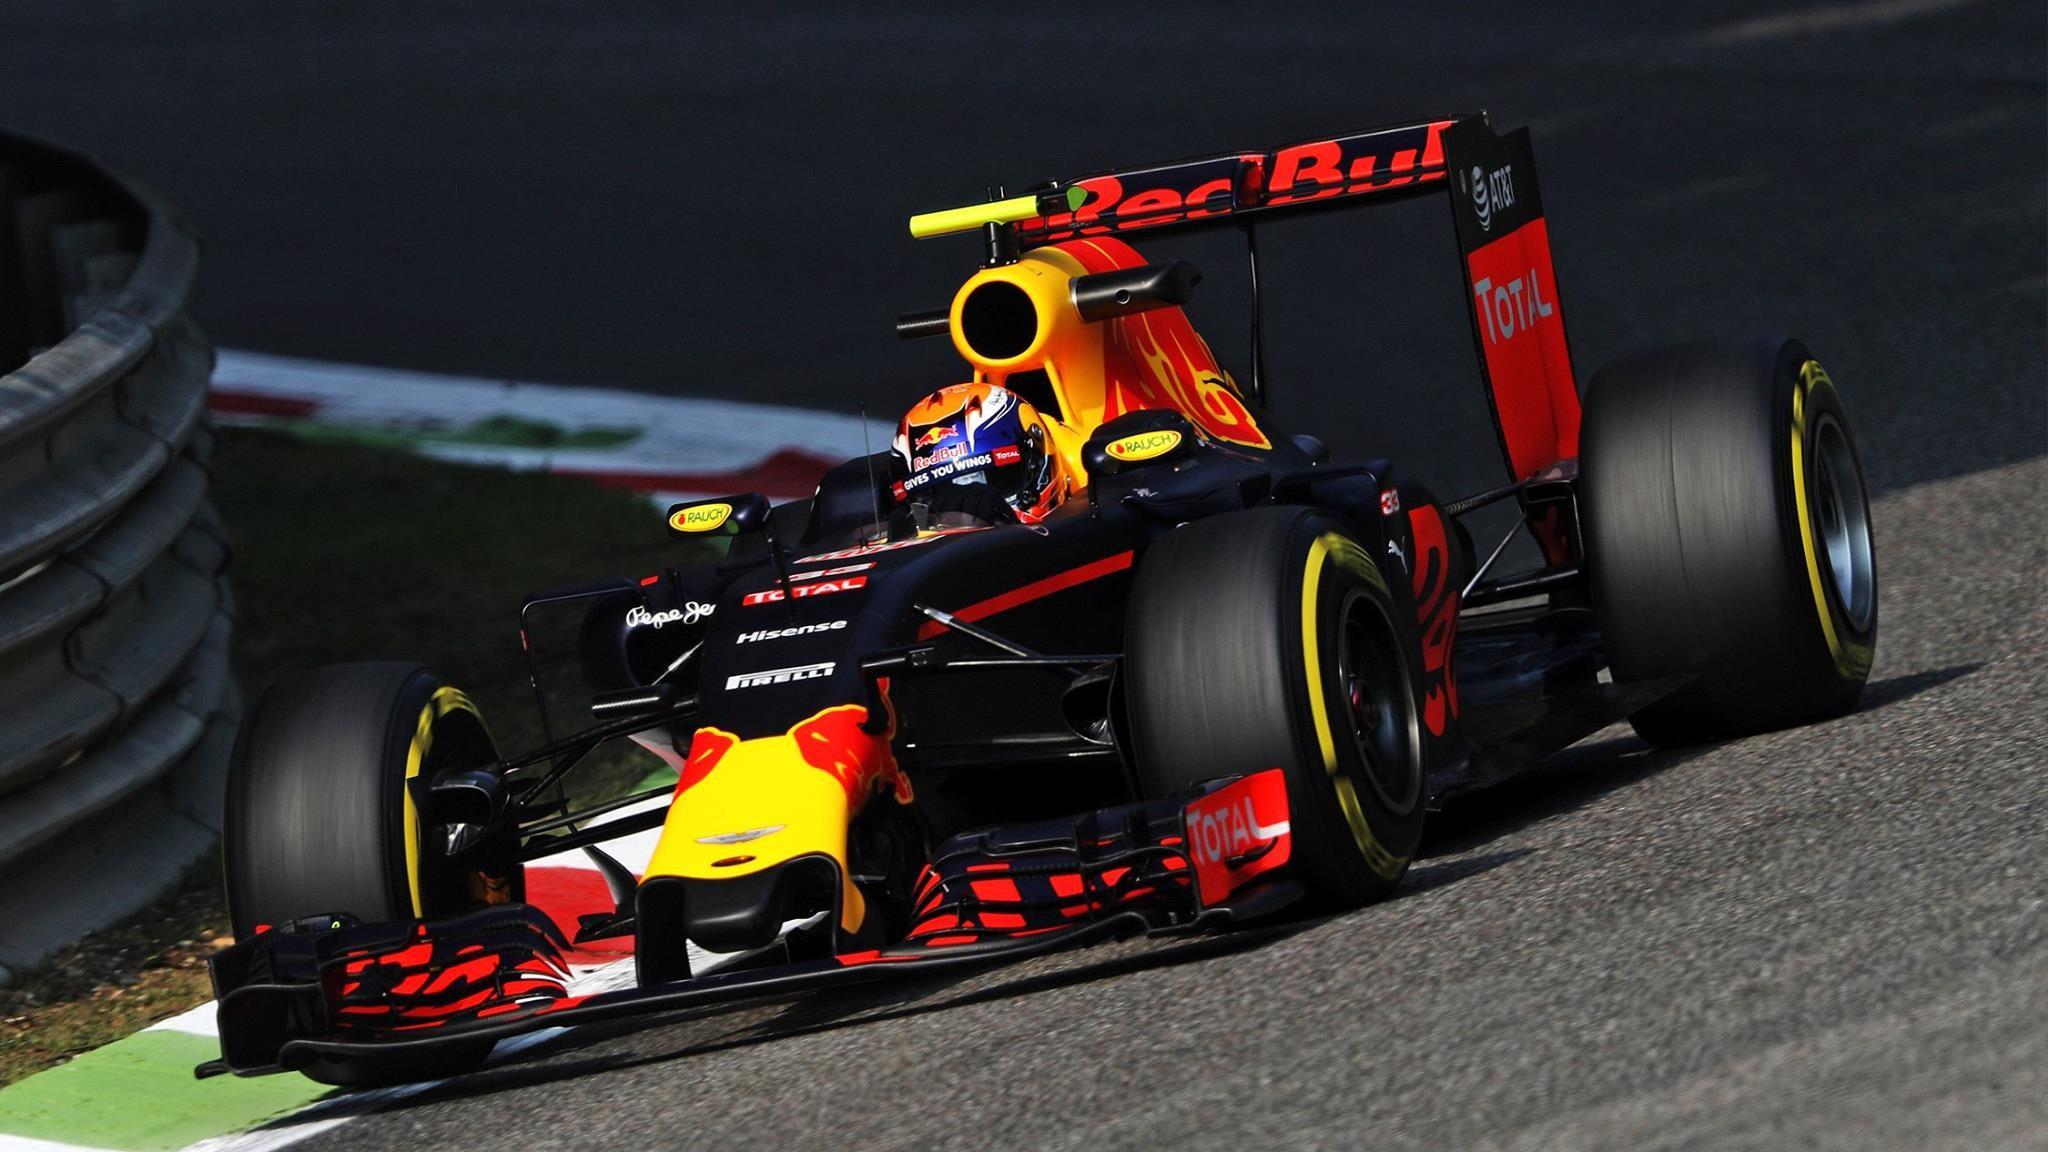 Red Bull F1 Wallpaper ①